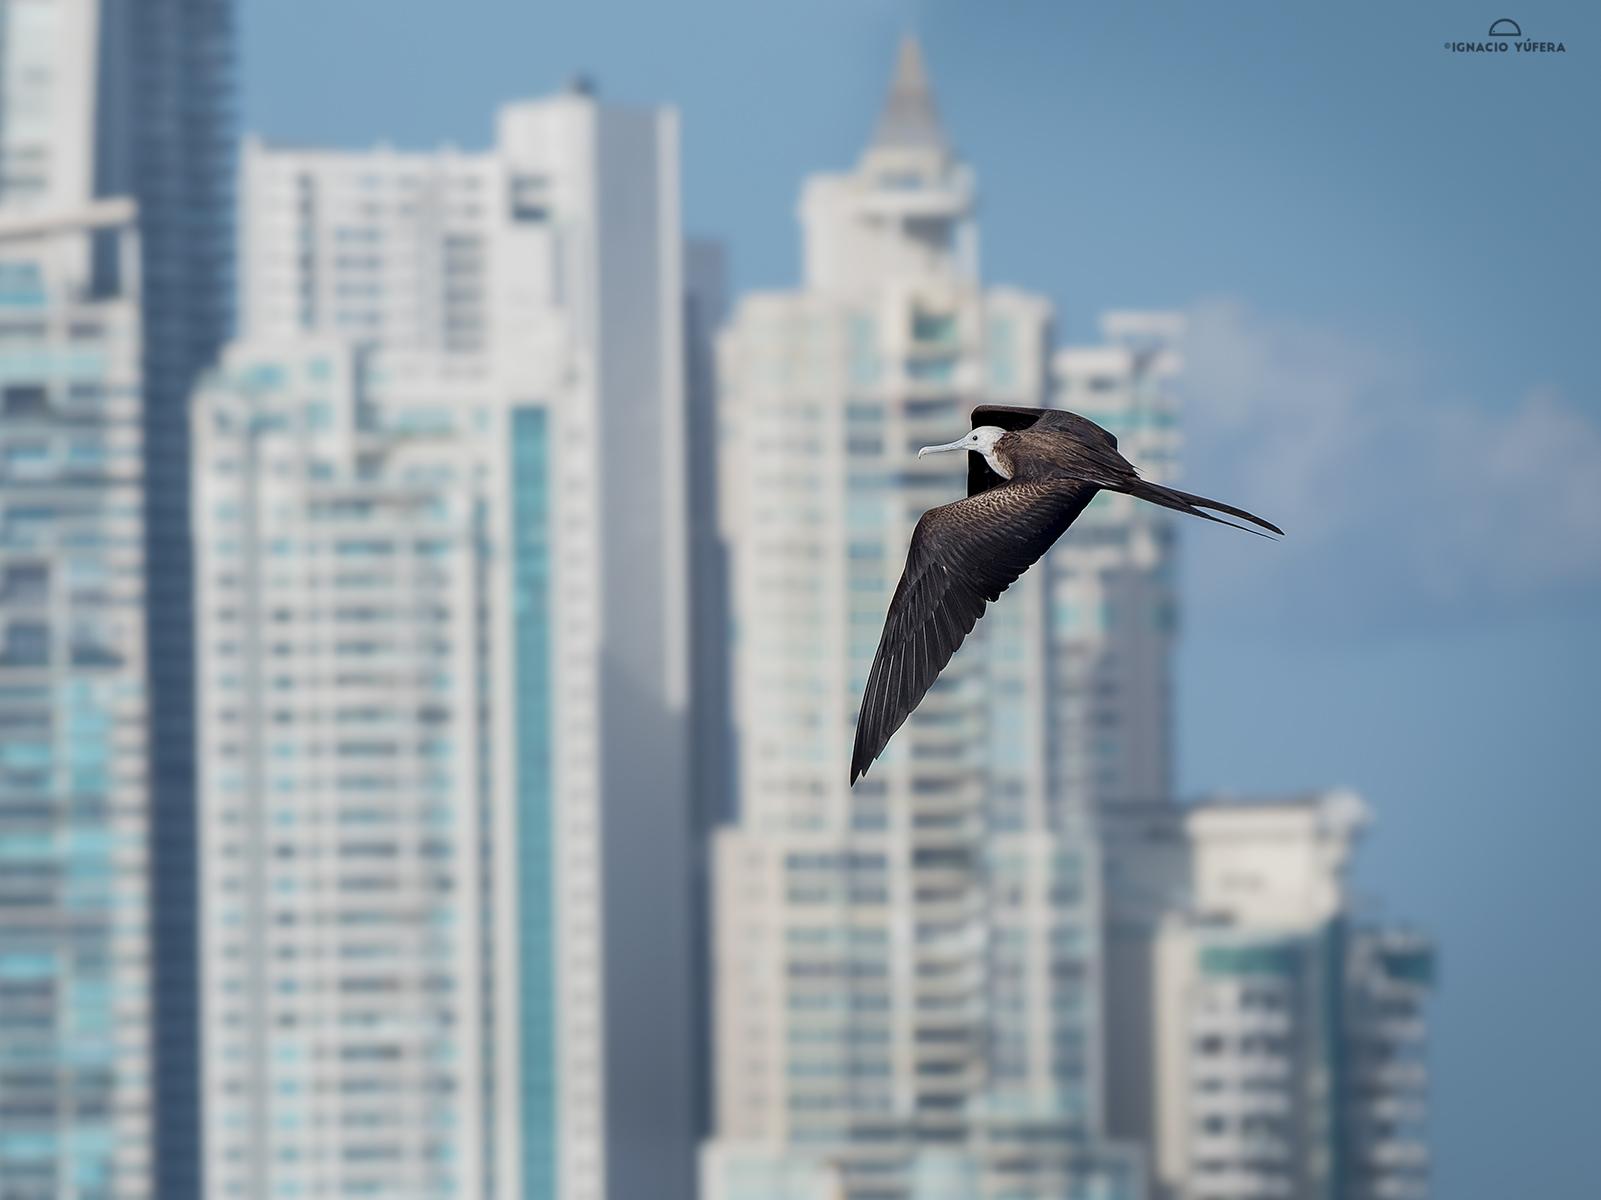 Magnificent Frigatebird (Fregata magnificens), Panama City